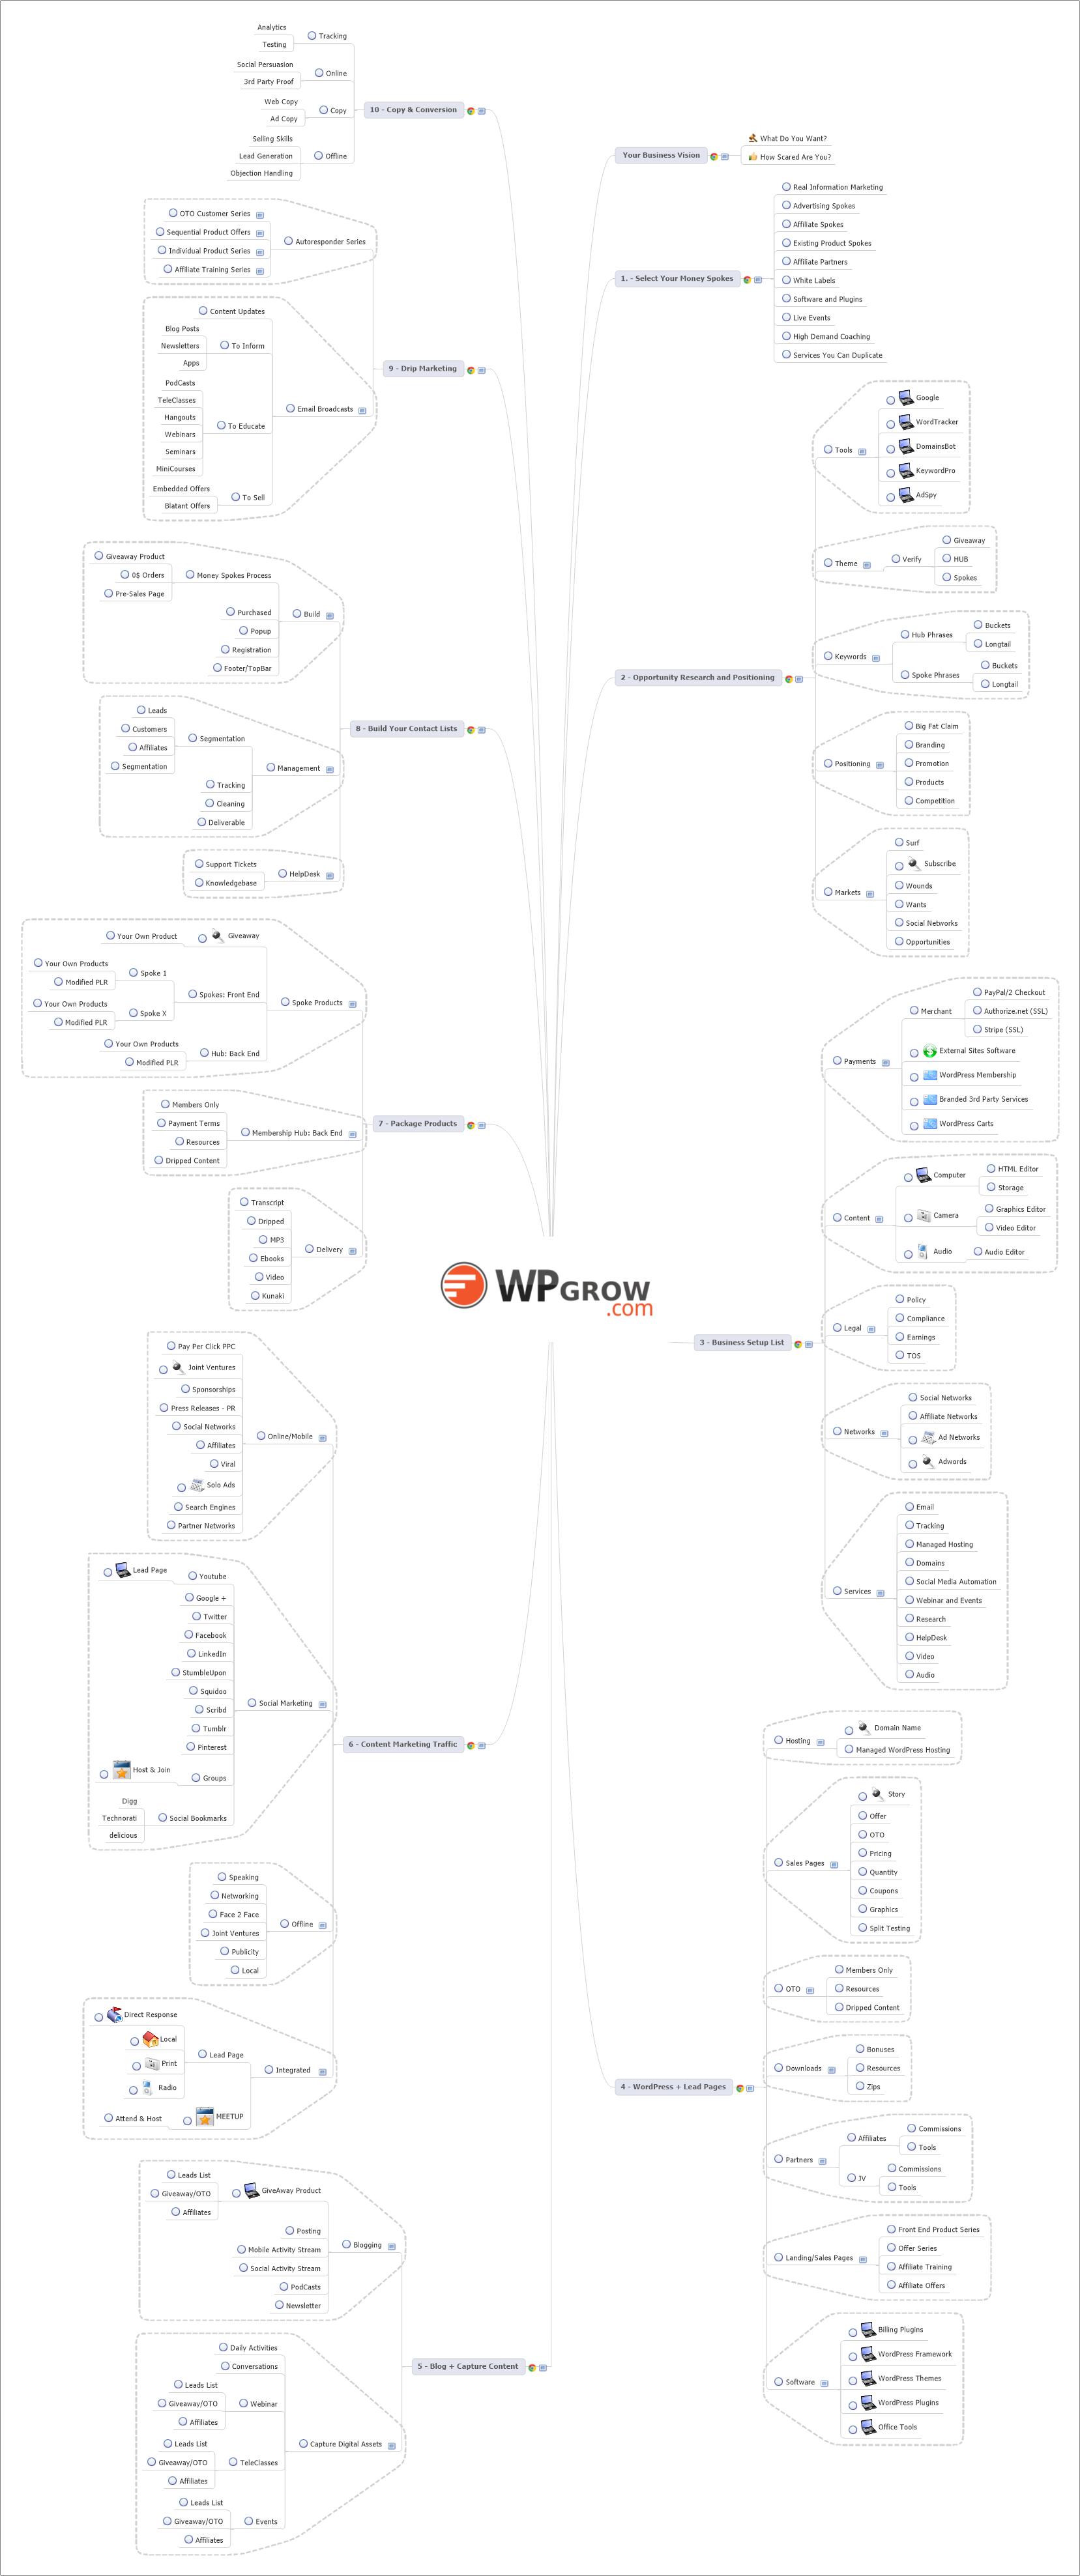 Downloads wordpress support pdf wpgrow wordpress marketing blueprint image malvernweather Image collections